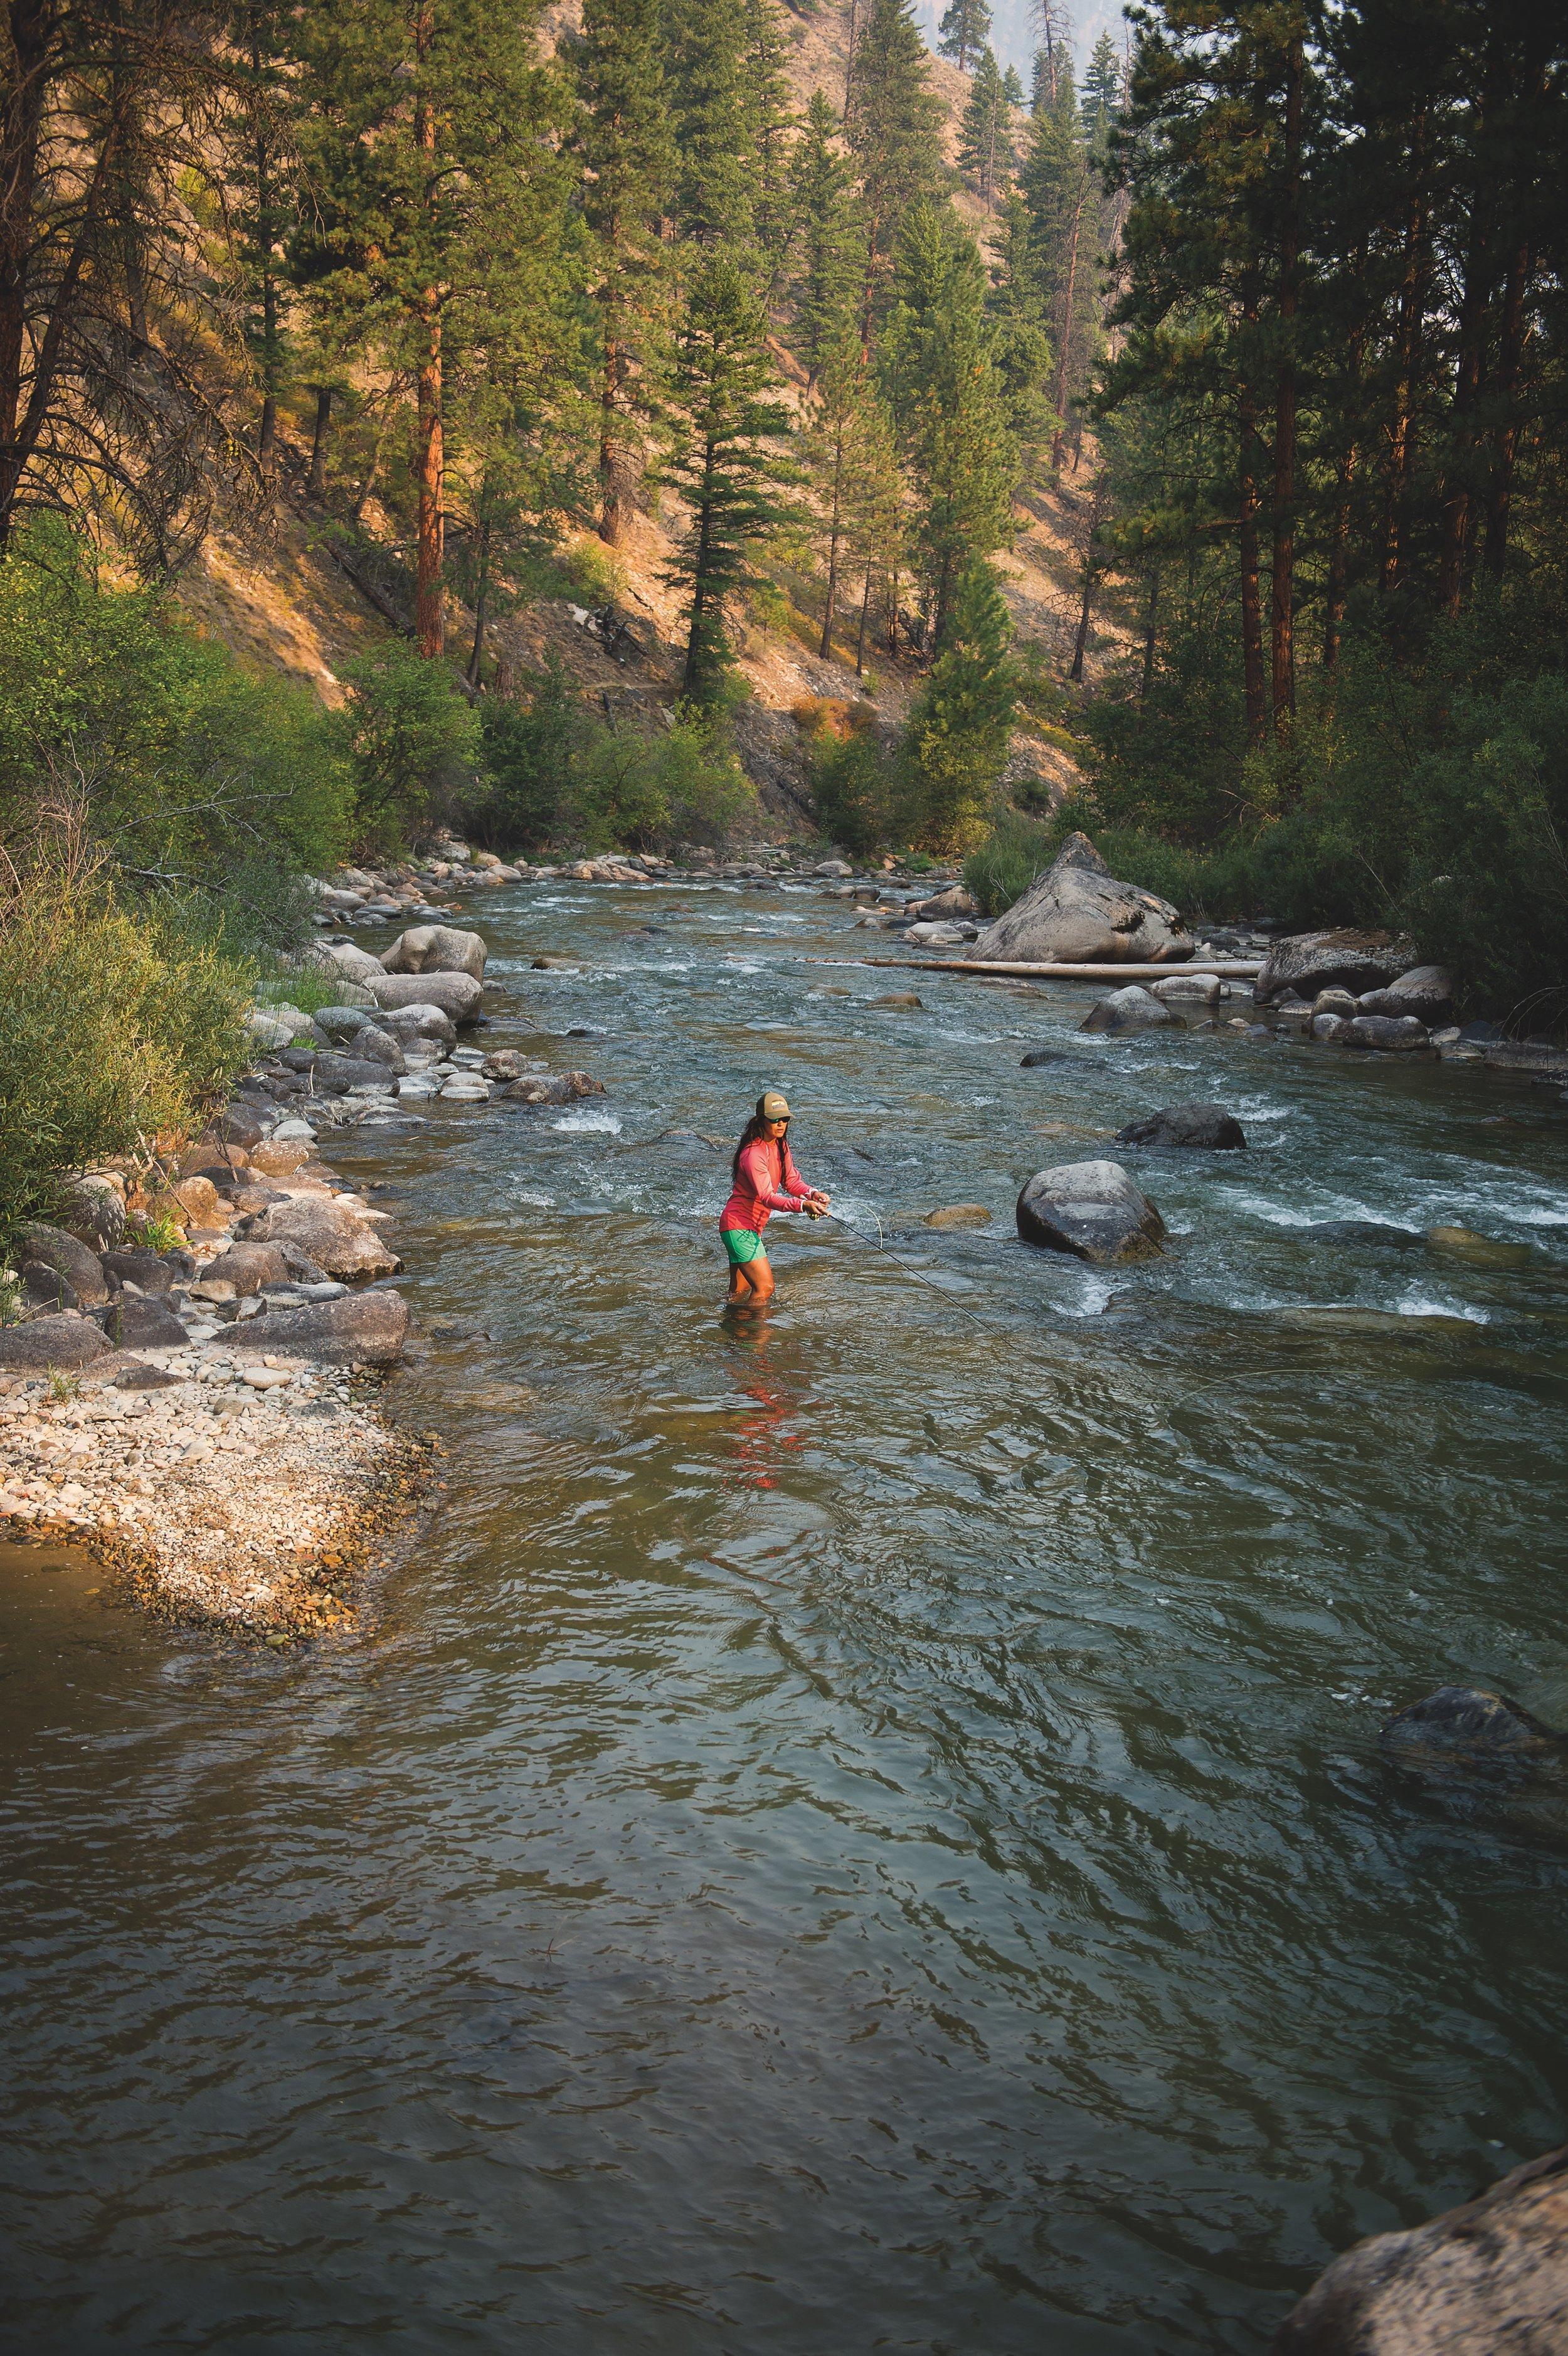 """Hillary Hutchenson, Loon Creek, Idaho""Photo credit to Lee Cohen"